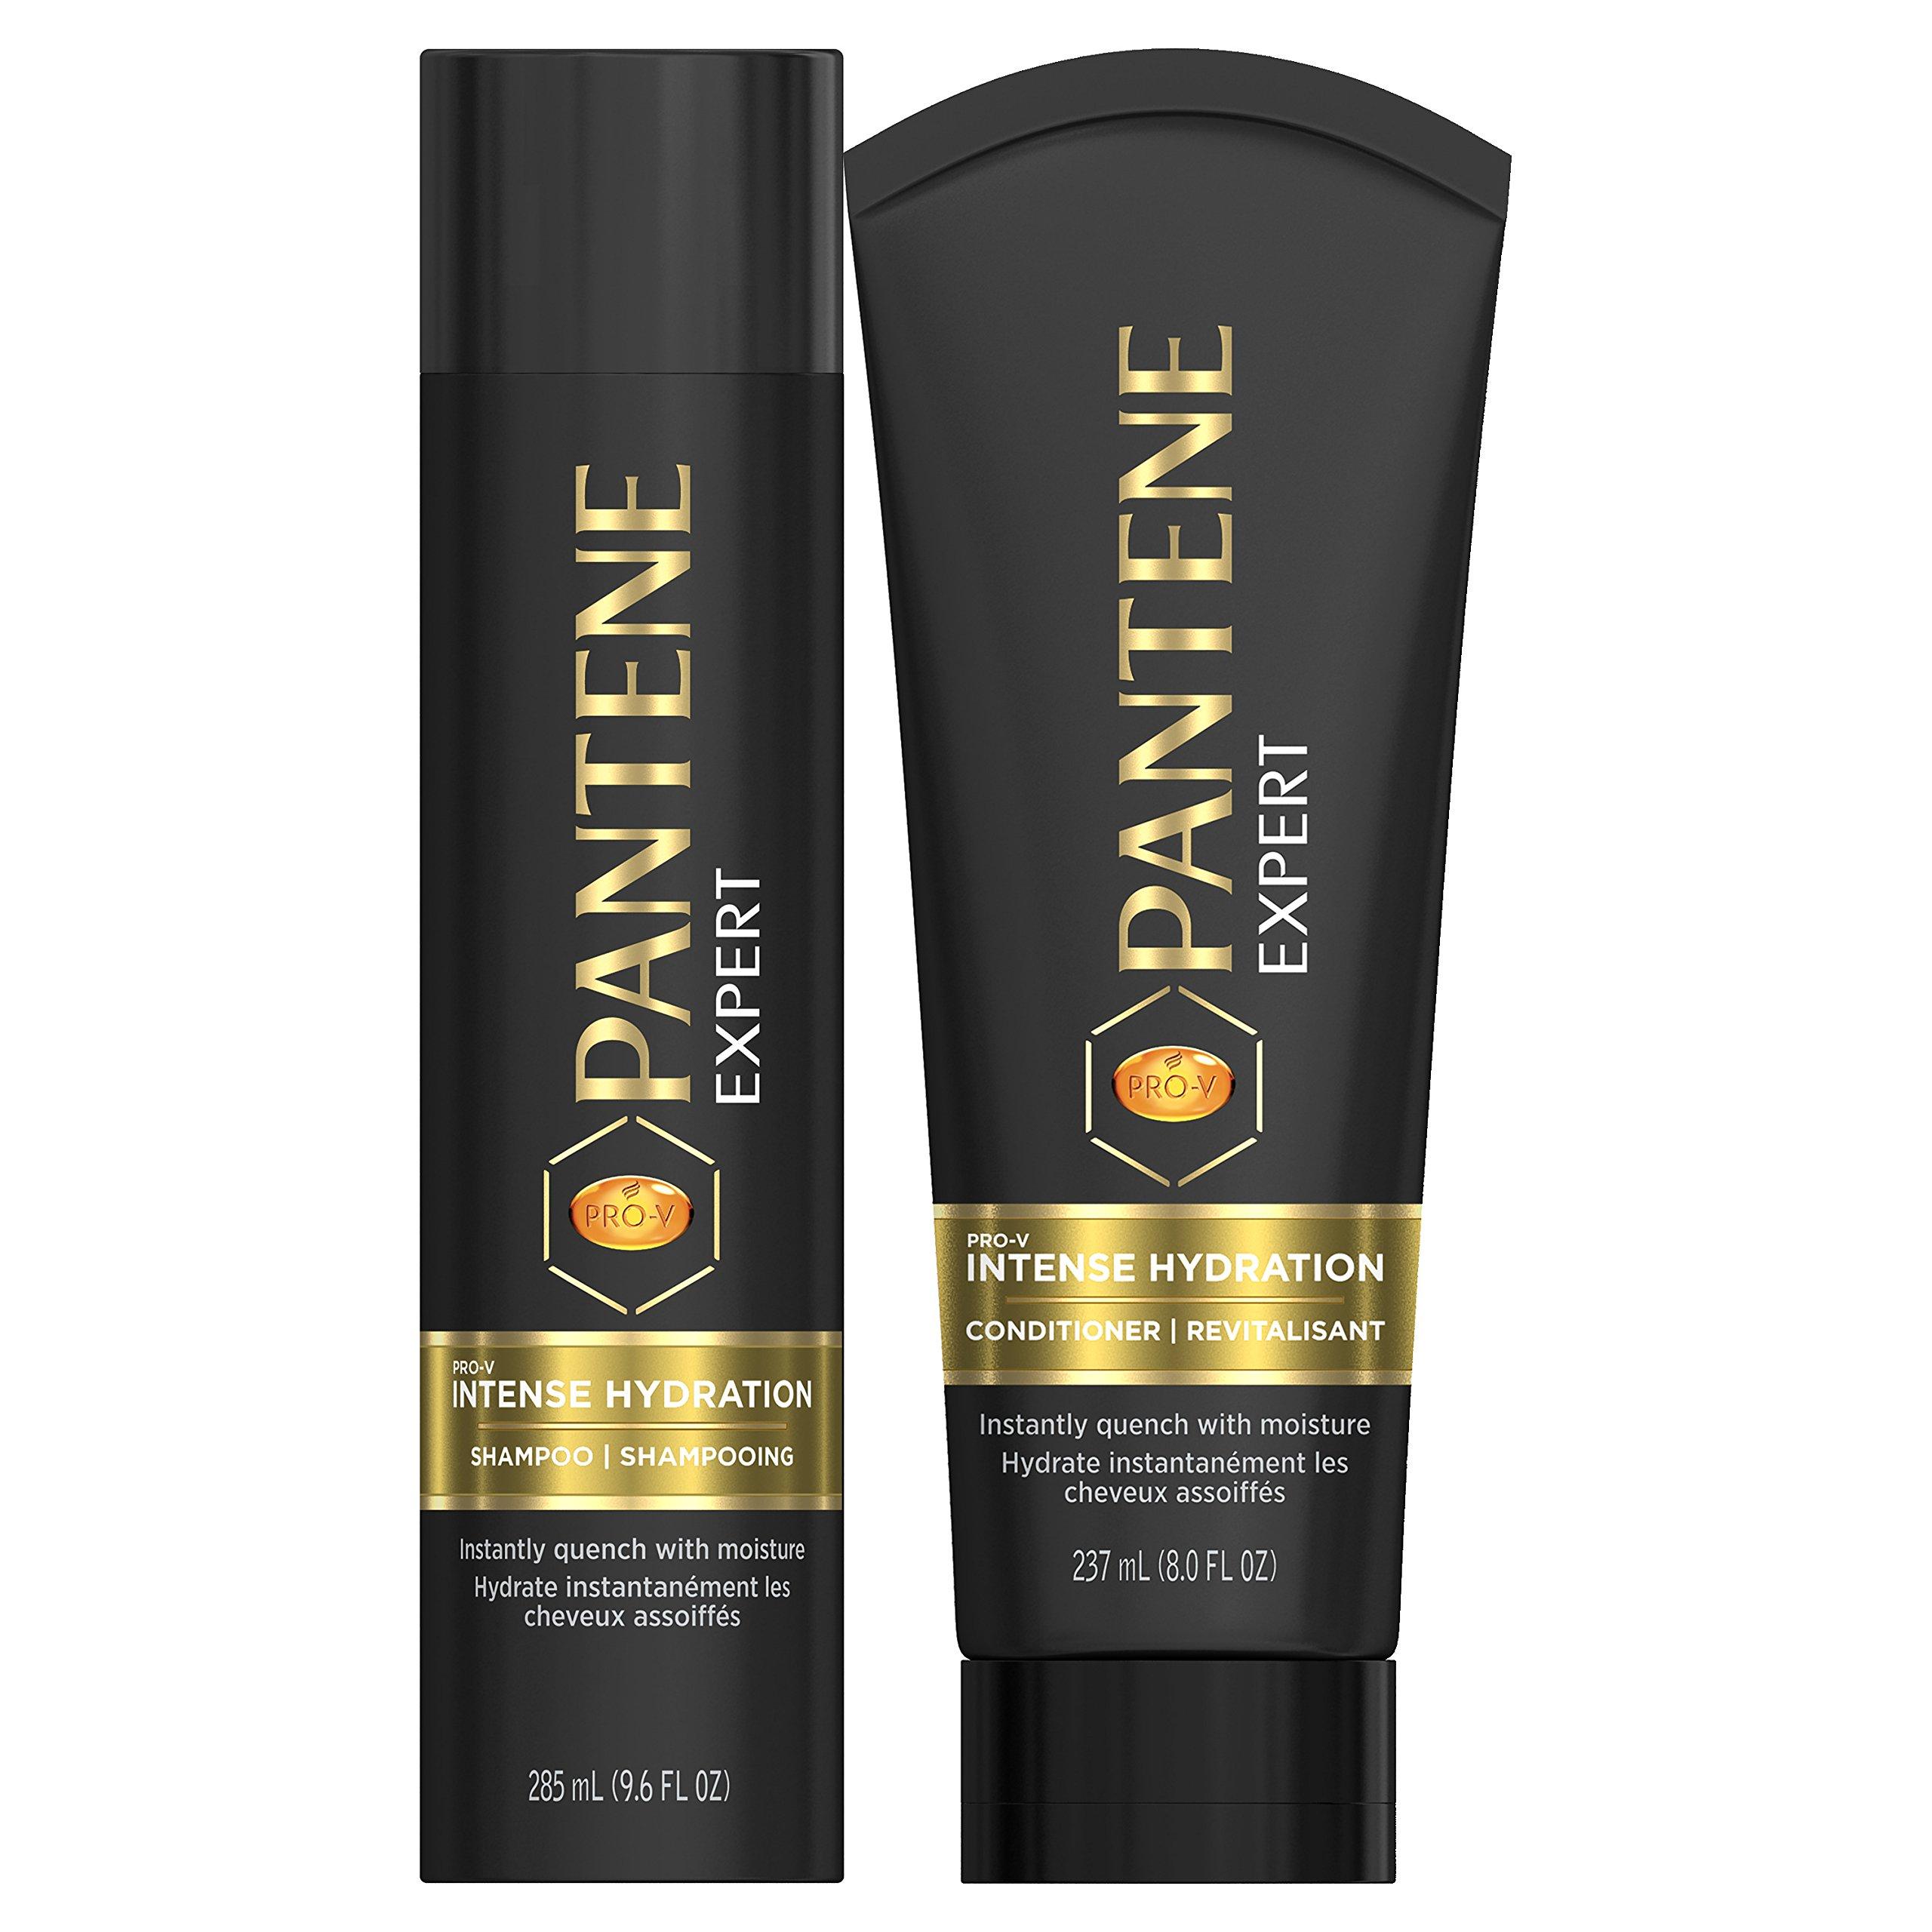 Pantene Expert Pro-V Intense Hydration Shampoo 9.6 fl oz and Conditioner 8.0 fl oz Set